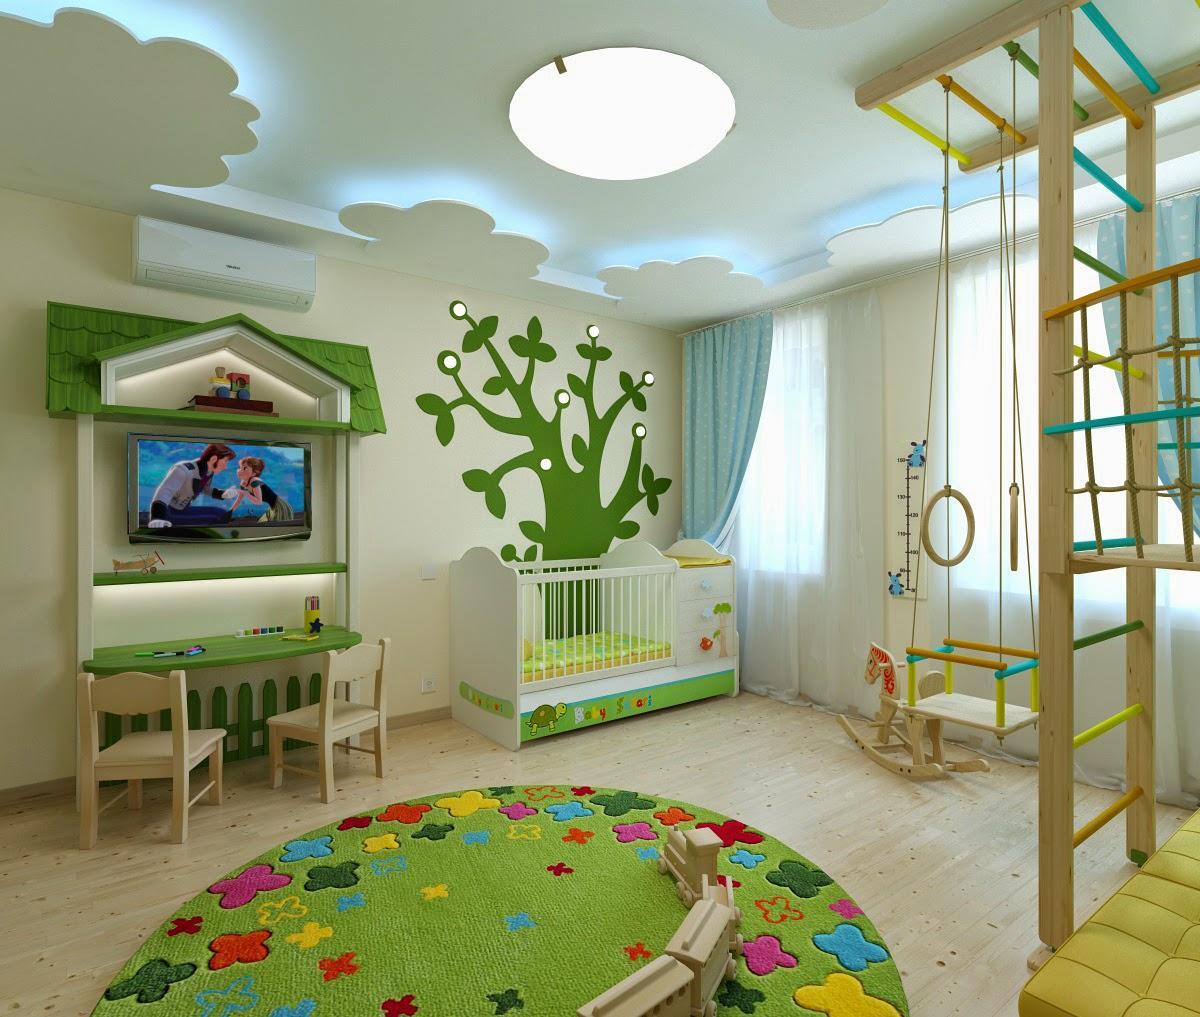 Bedroom Decor Brown Childrens Bedroom Ceiling Lights Bedroom Bench Target Unique Bedroom Art: дизайн интерьера: Детская комната для двоих. Квартира в